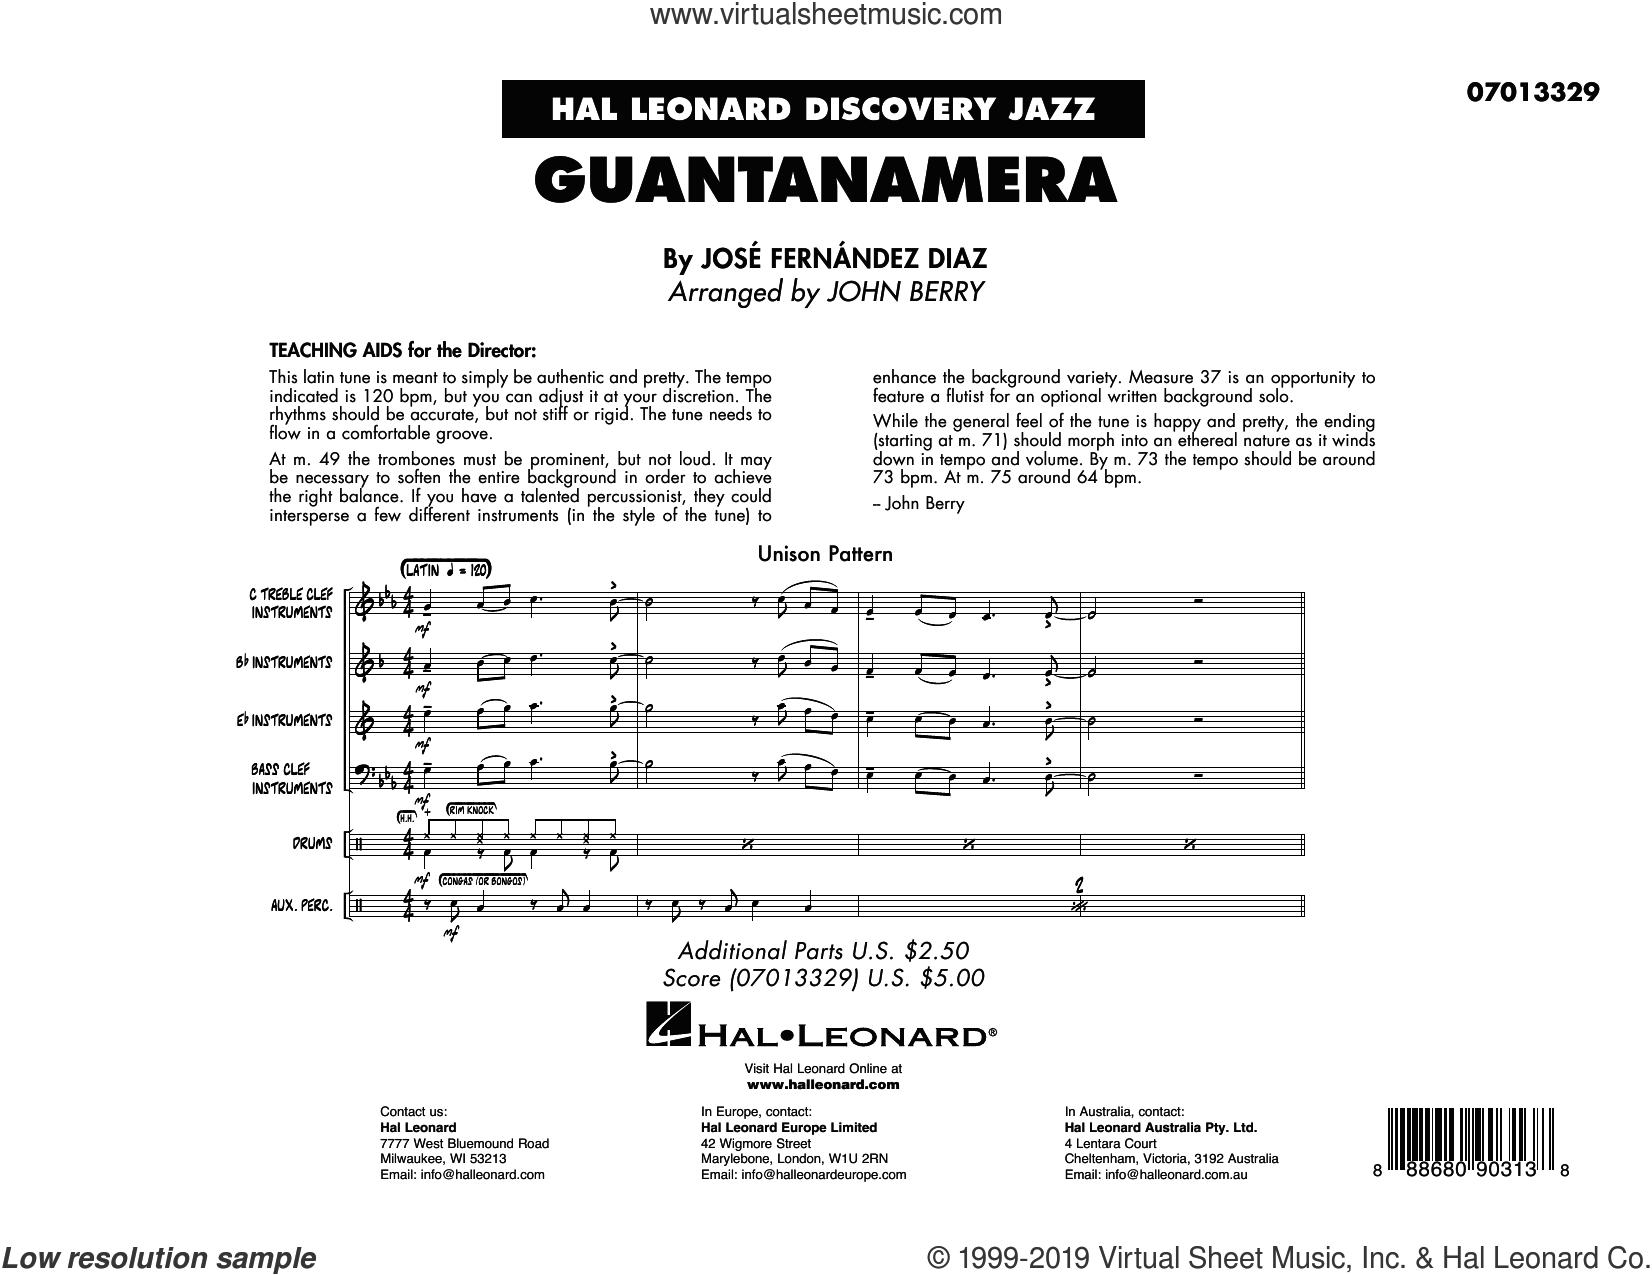 Guantanamera (arr. John Berry) (COMPLETE) sheet music for jazz band by John Berry and Jose Fernandez Diaz, intermediate skill level